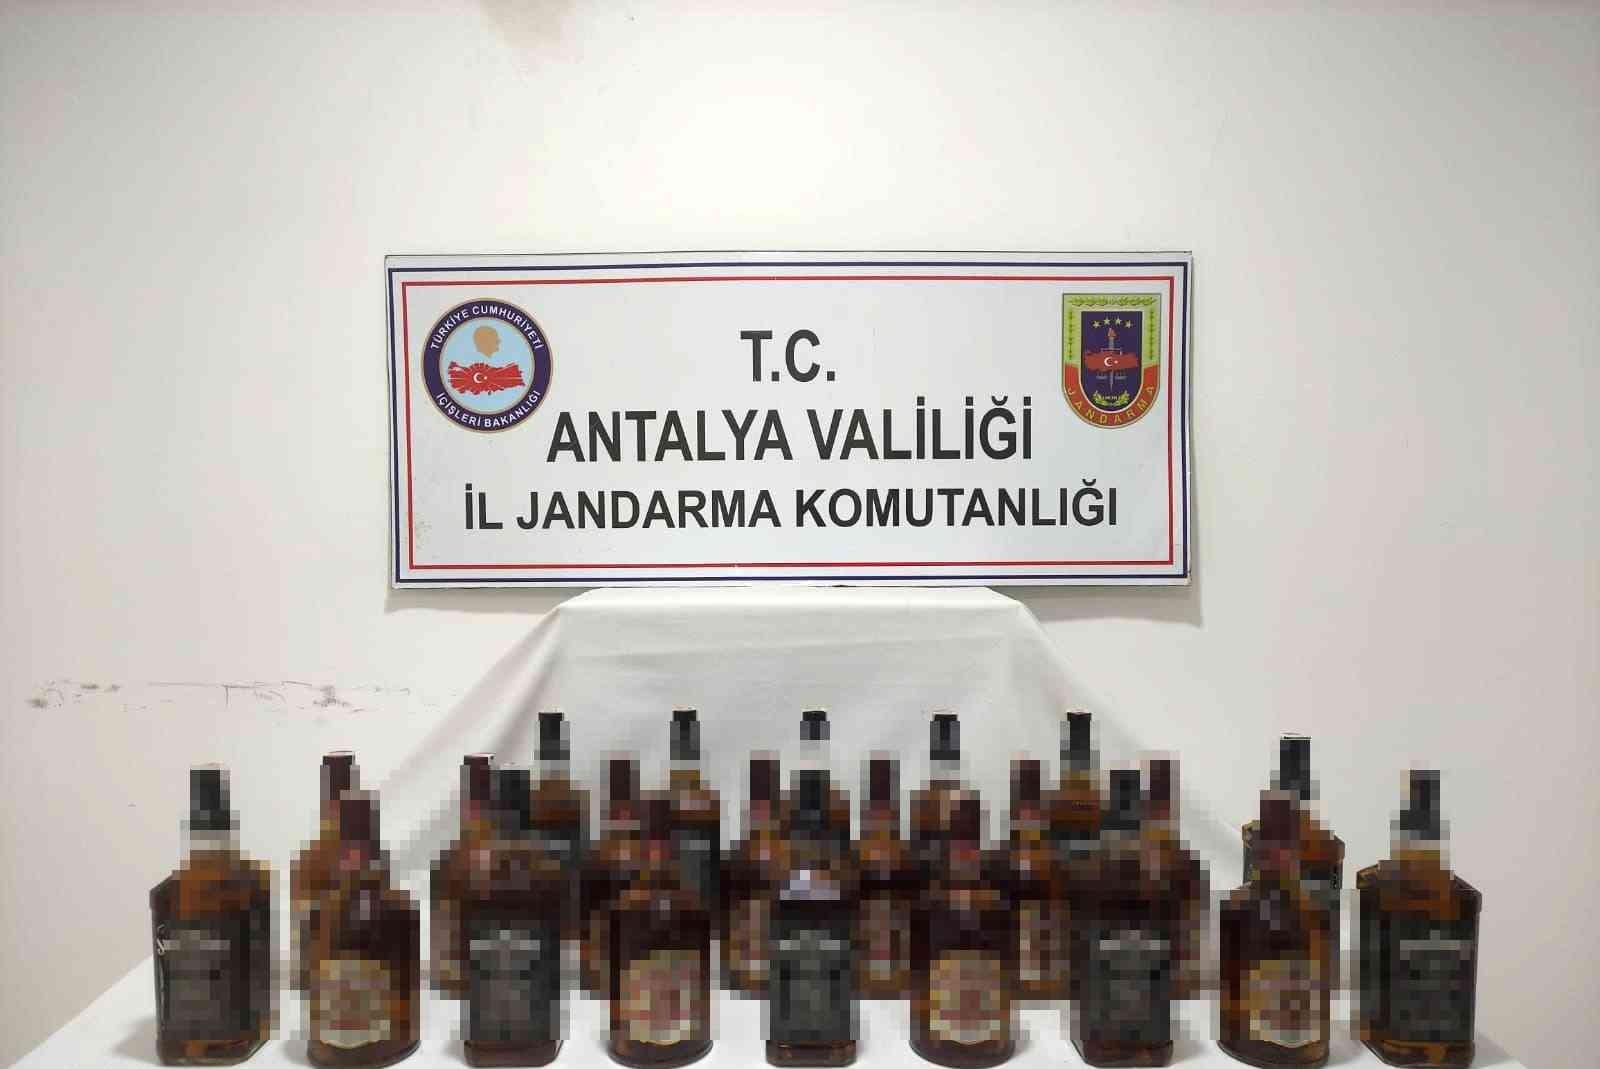 Manavgat'ta 22 litre kaçak-sahte içki ele geçirildi